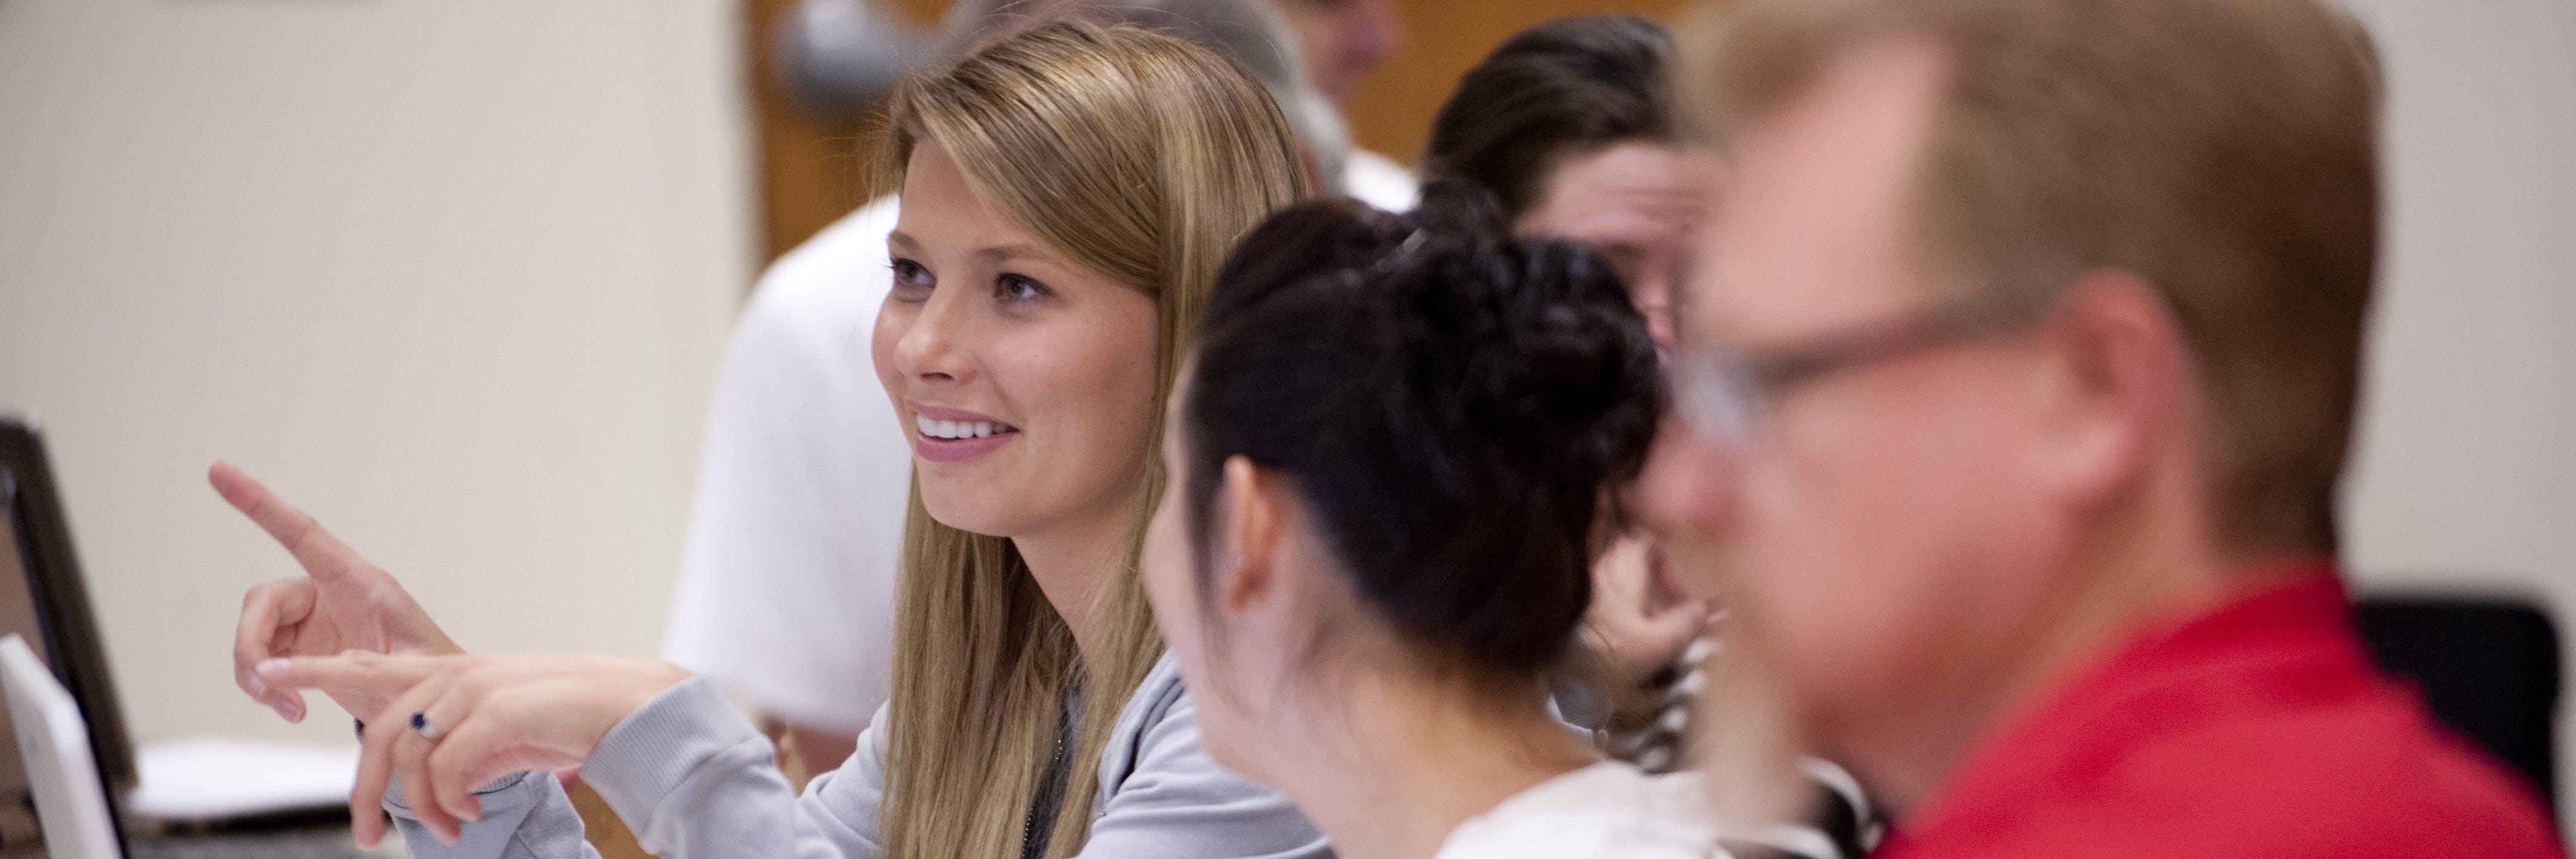 Bethel student talking in class